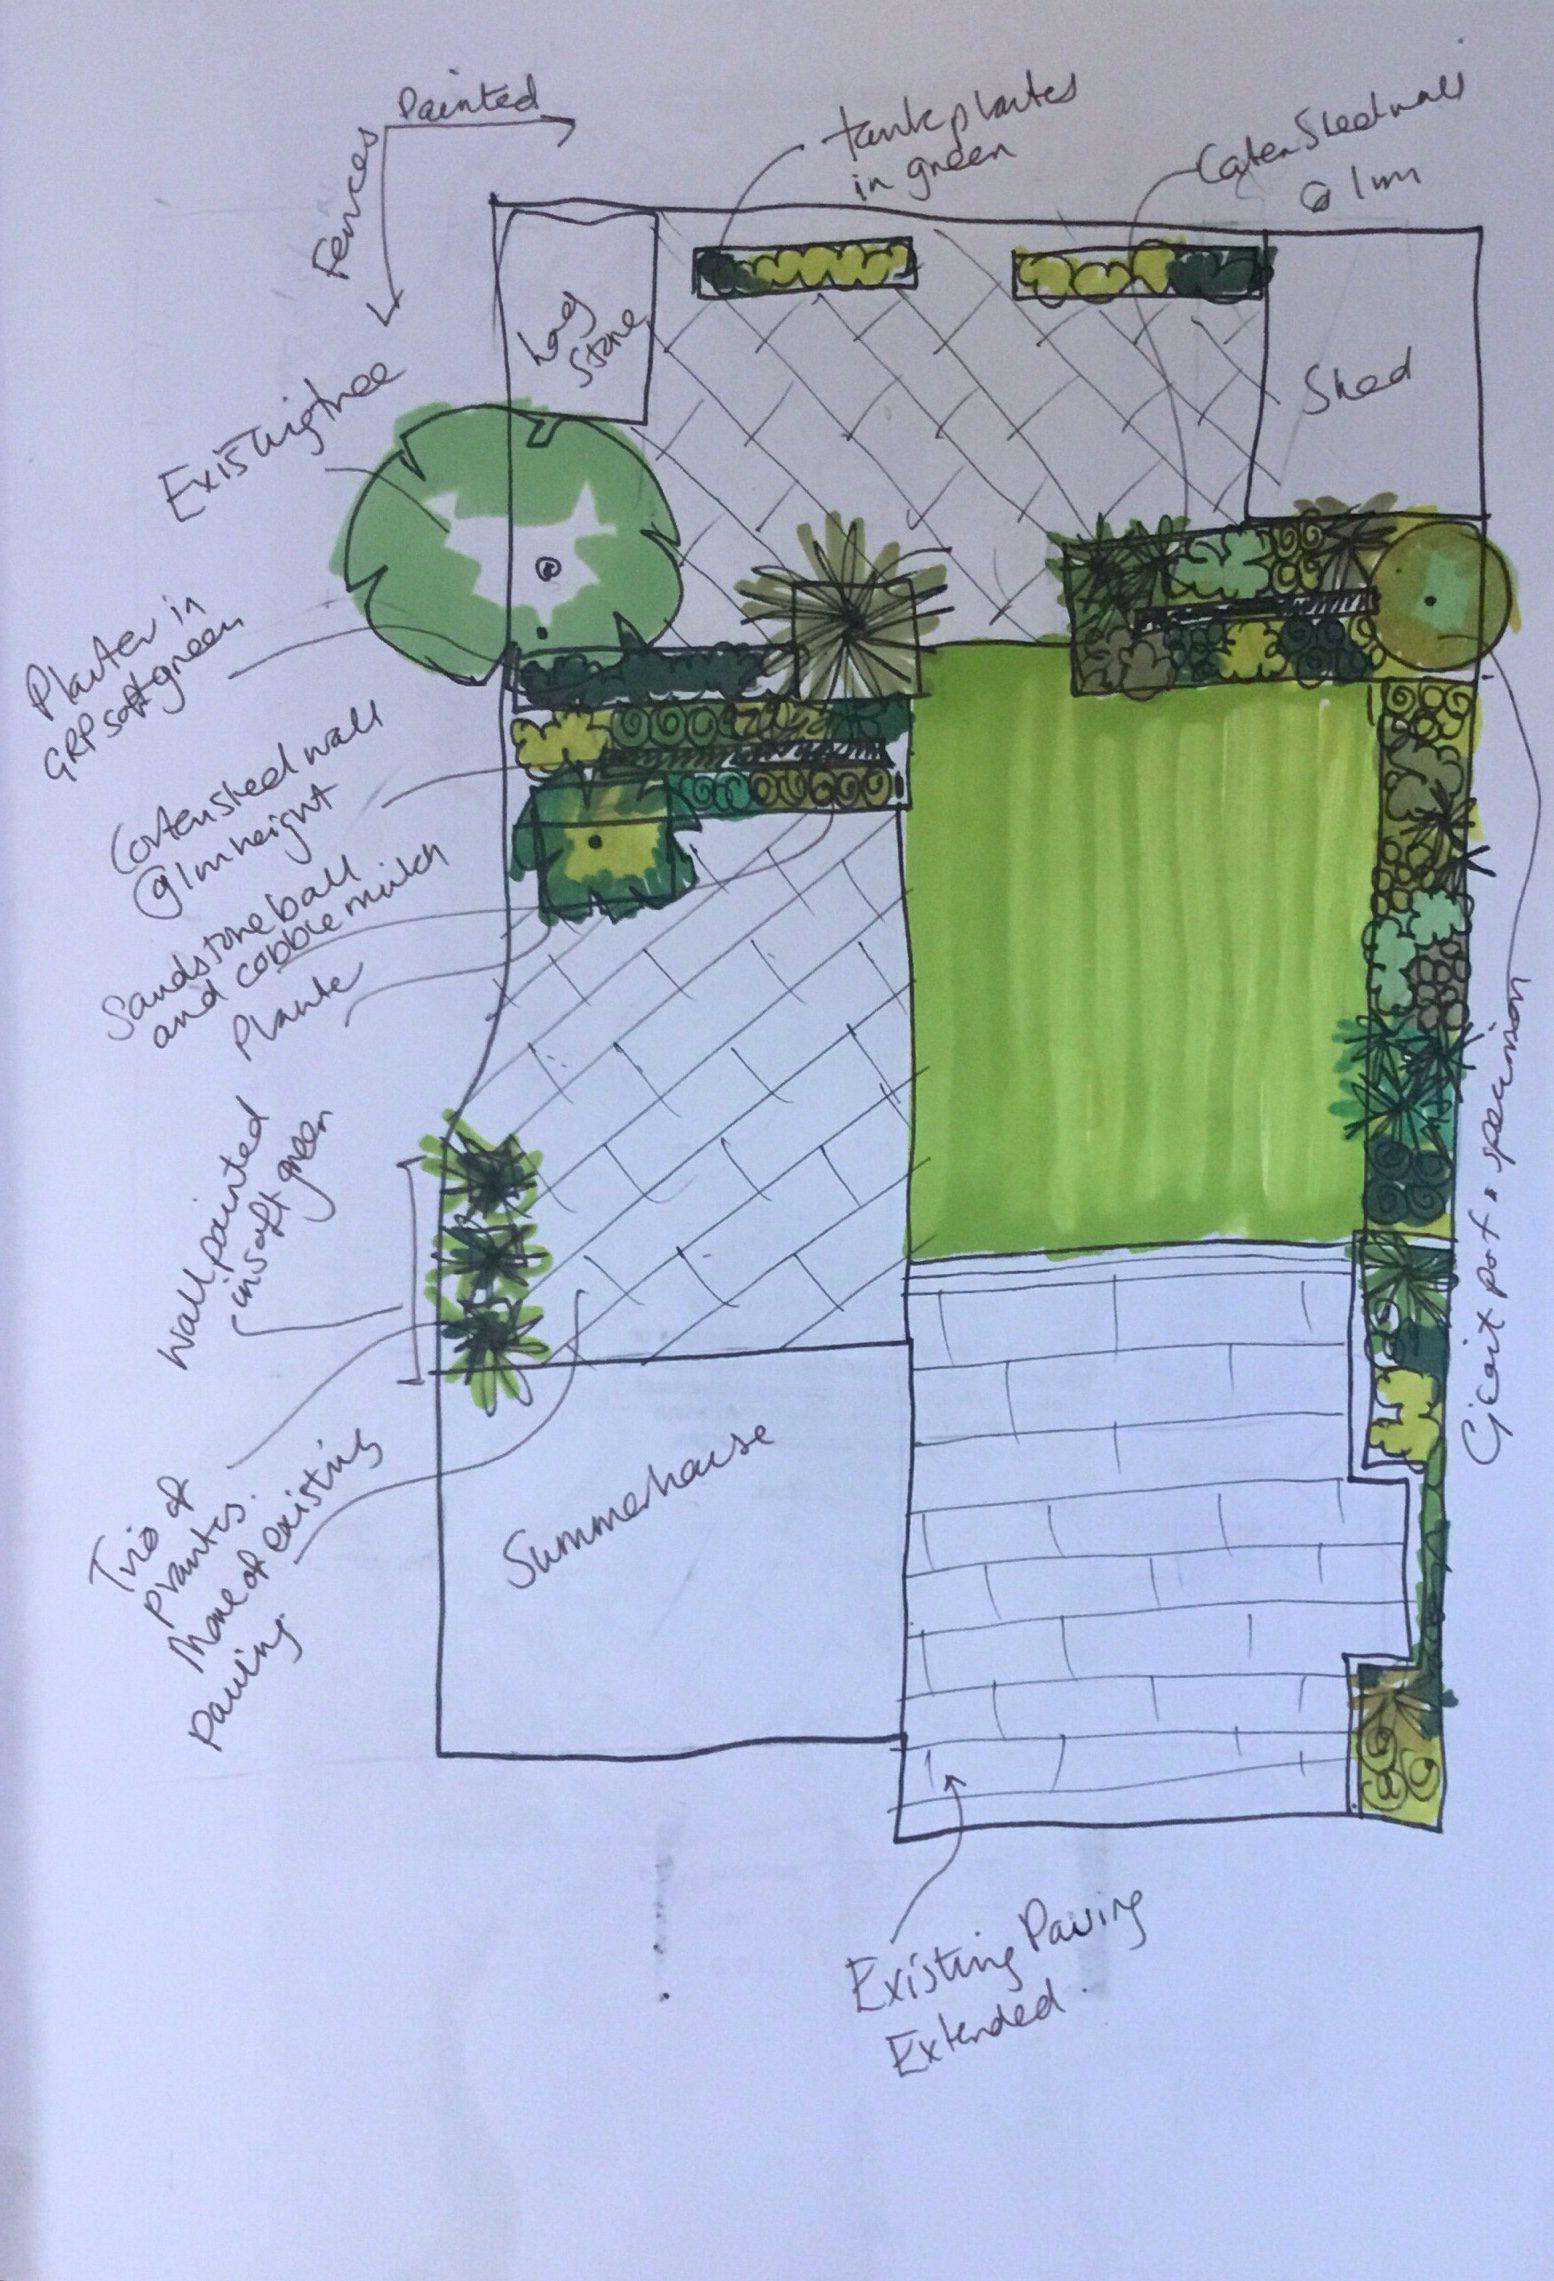 Garden design hotline #9: Avoid garden disaster, get a designer